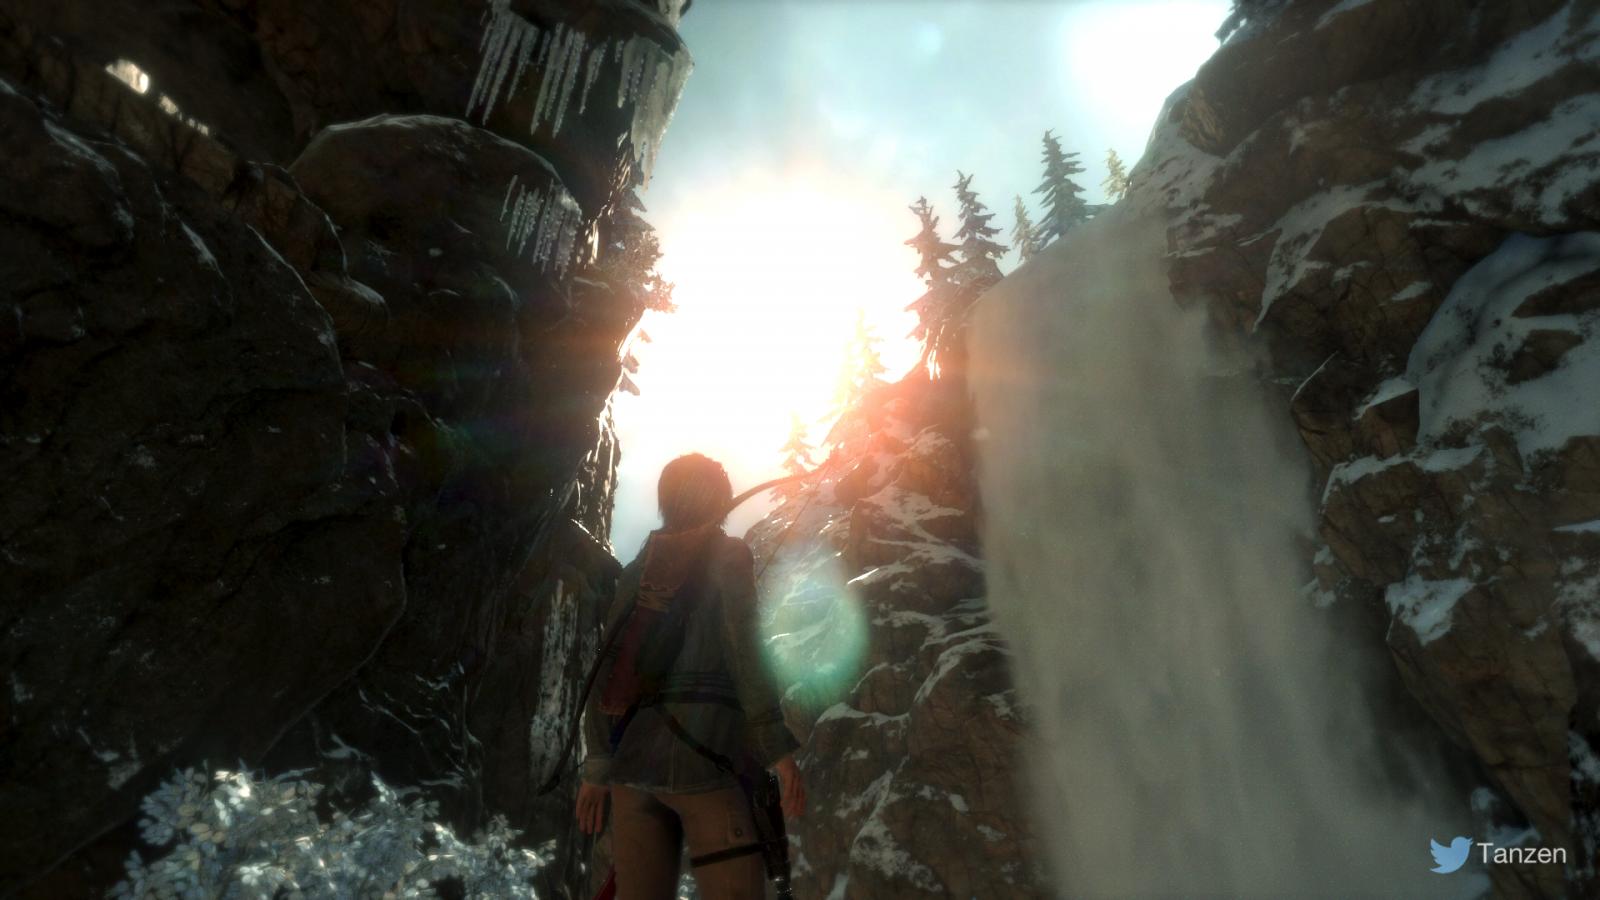 Rise of the Tomb Raider Screen Shot 09.11.15 20. 12_watermark